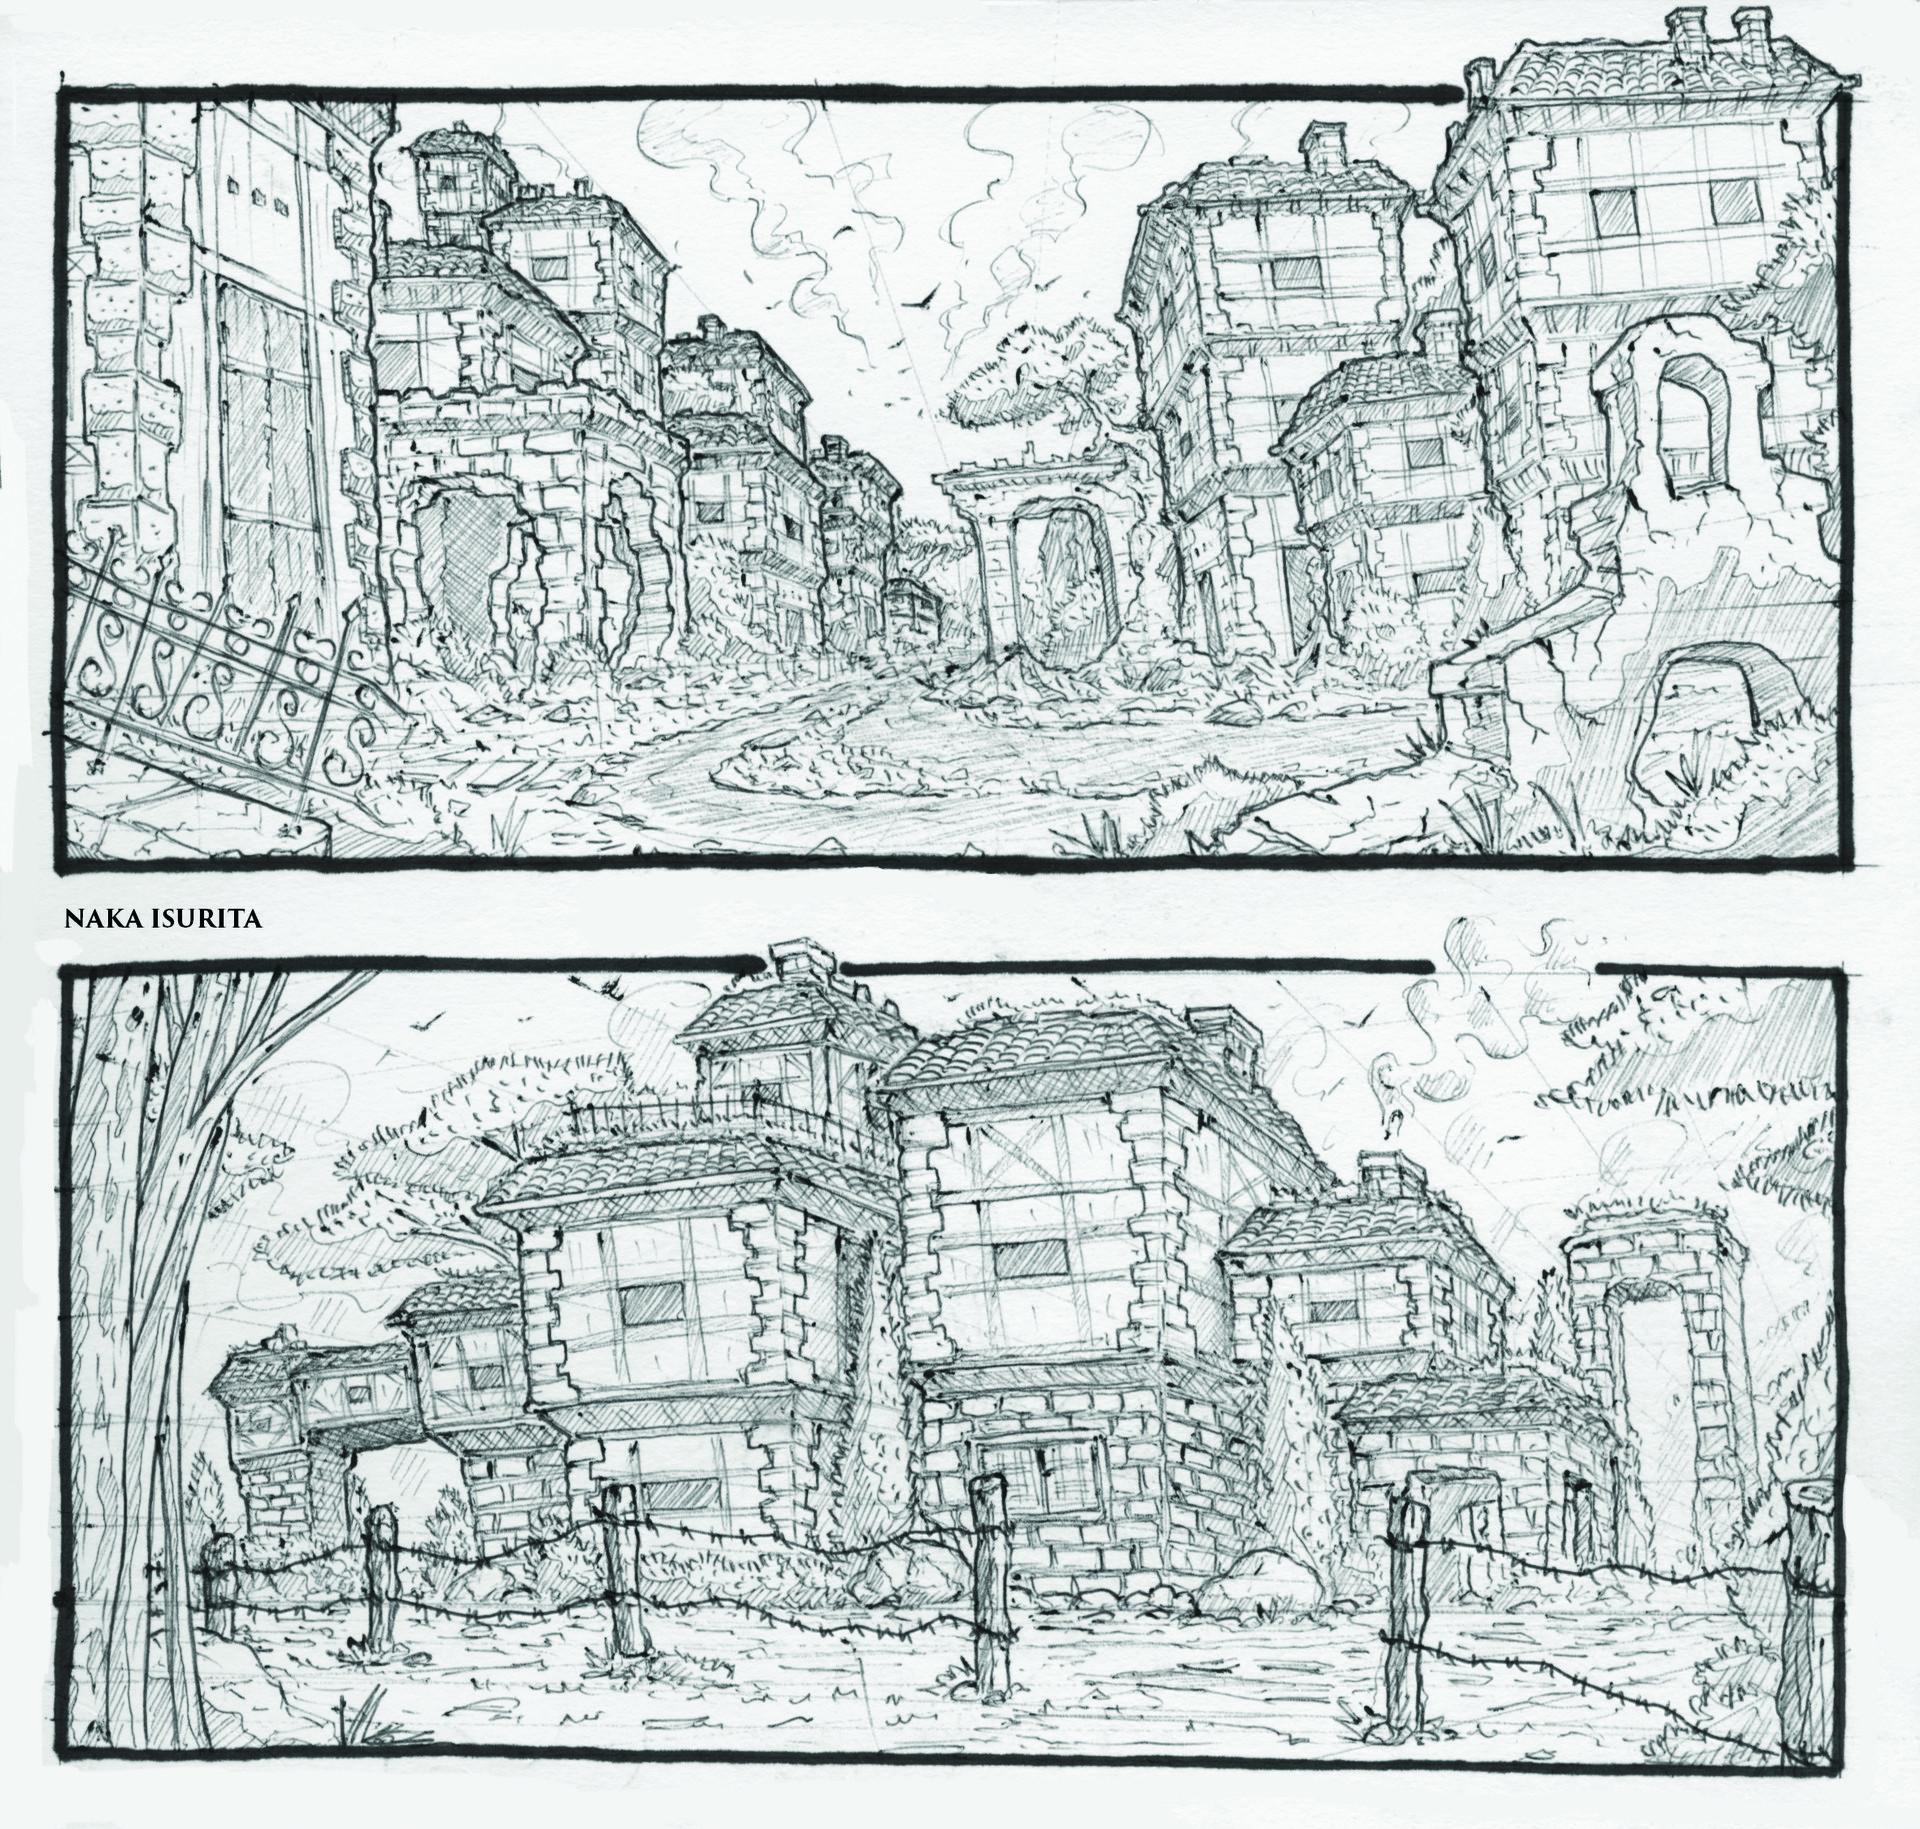 Naka isurita environment sketch 01